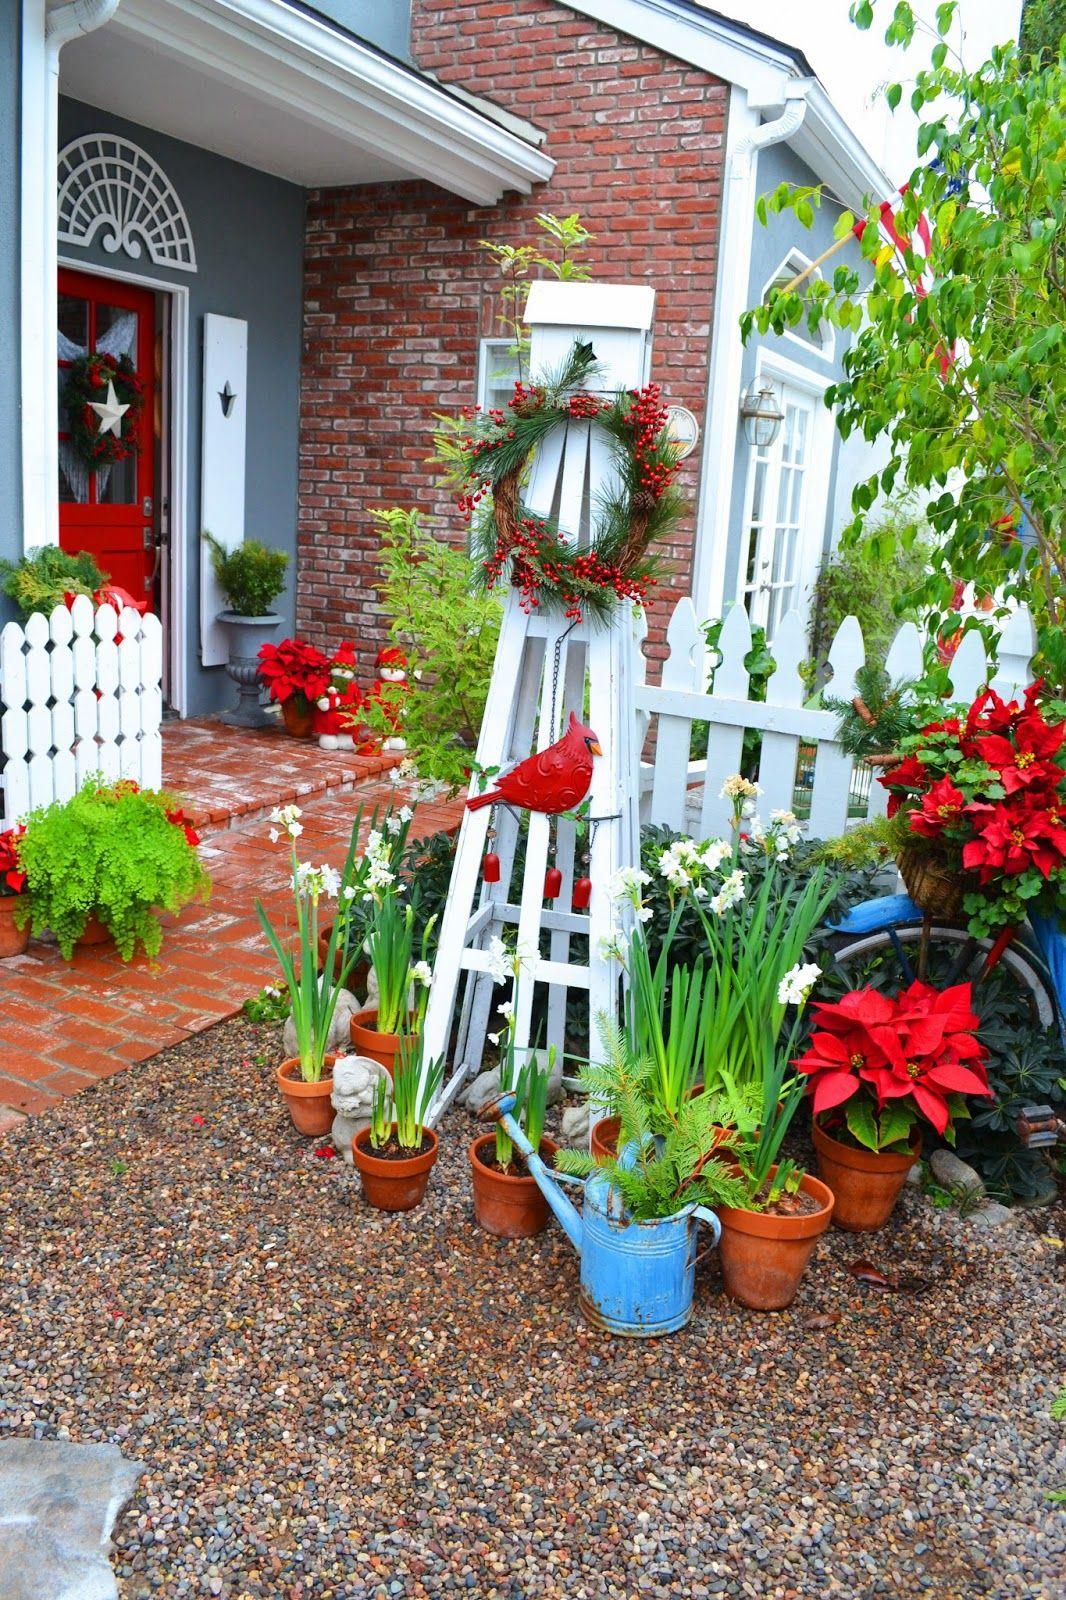 New home garden ideas  My Painted Garden Christmas Cottage HomeGarden Tour  Adorn Your